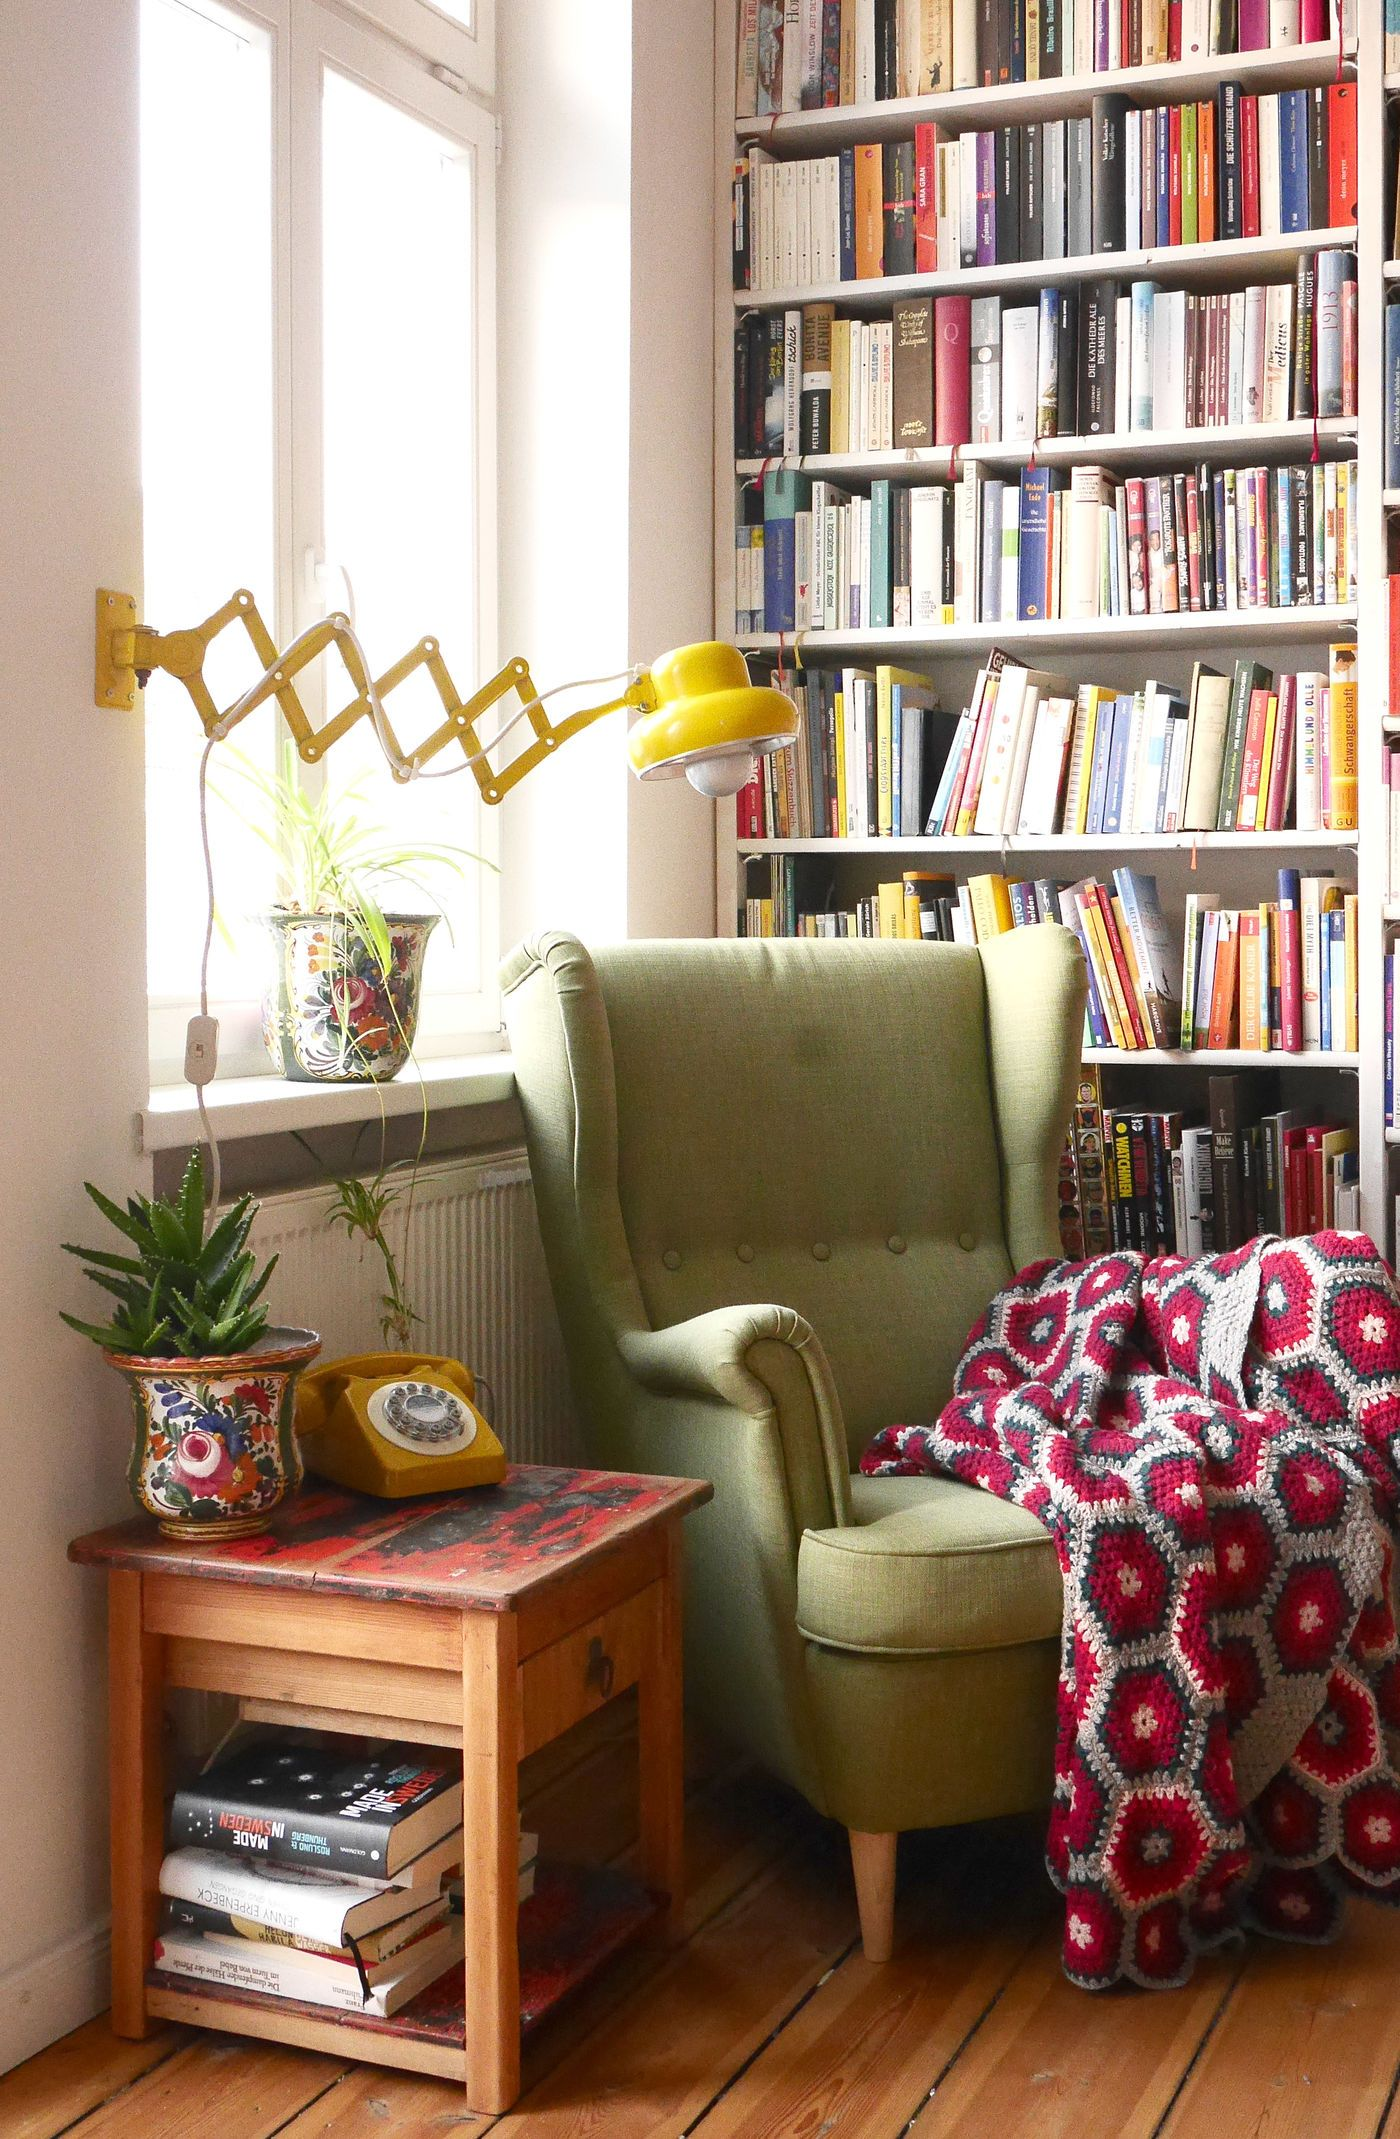 Full Size of Ikea Relaxsessel Elektrisch Strandmon Muren Leder Sessel Gebraucht Schnsten Ideen Fr Deinen Modulküche Küche Kosten Garten Sofa Mit Schlaffunktion Betten Wohnzimmer Ikea Relaxsessel